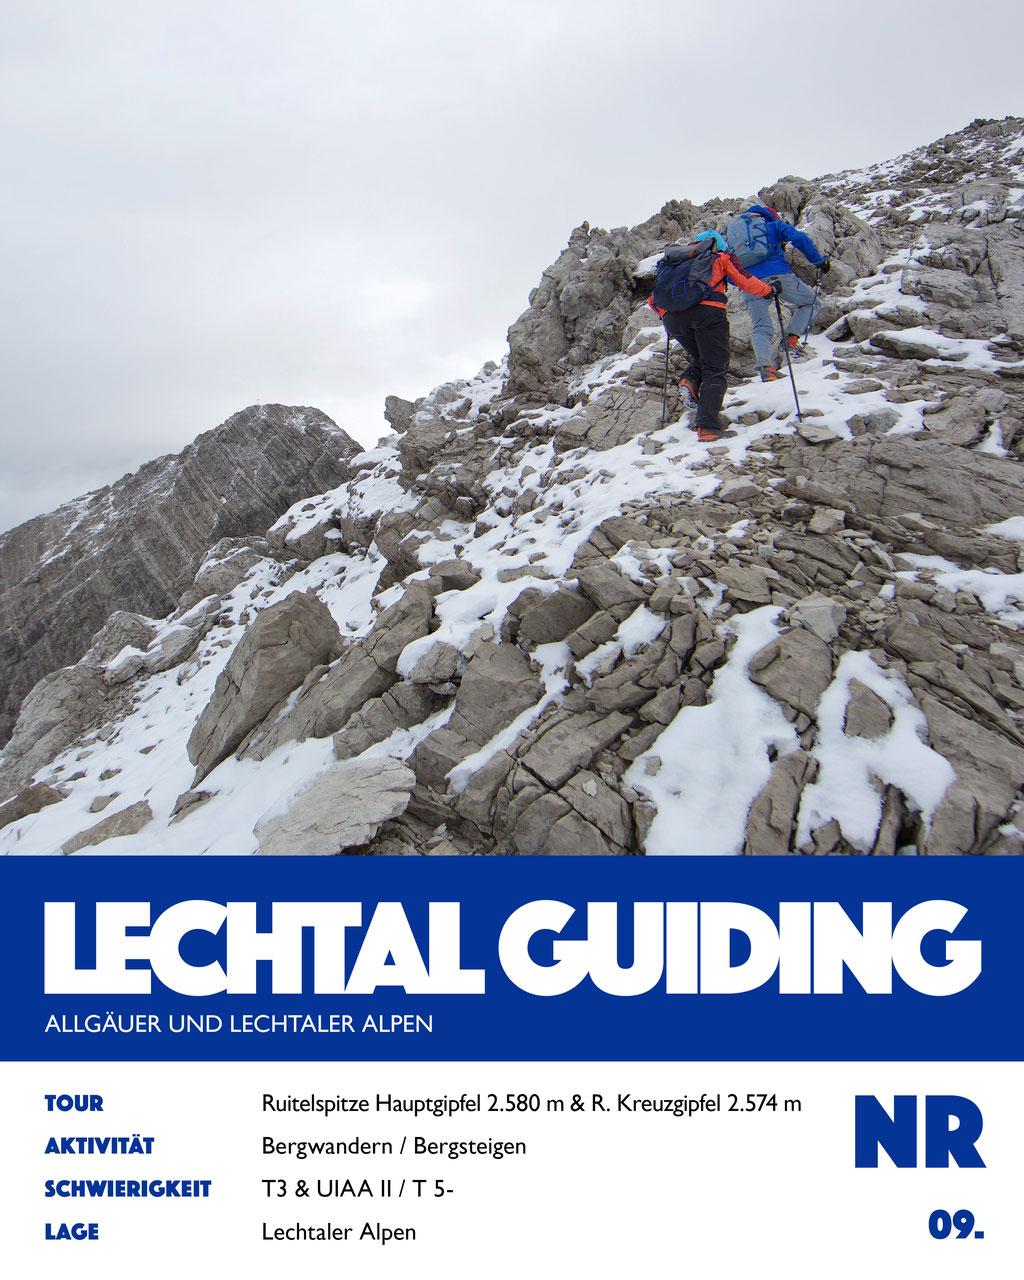 Bergtour - Ruitelspitze Hauptgipfel